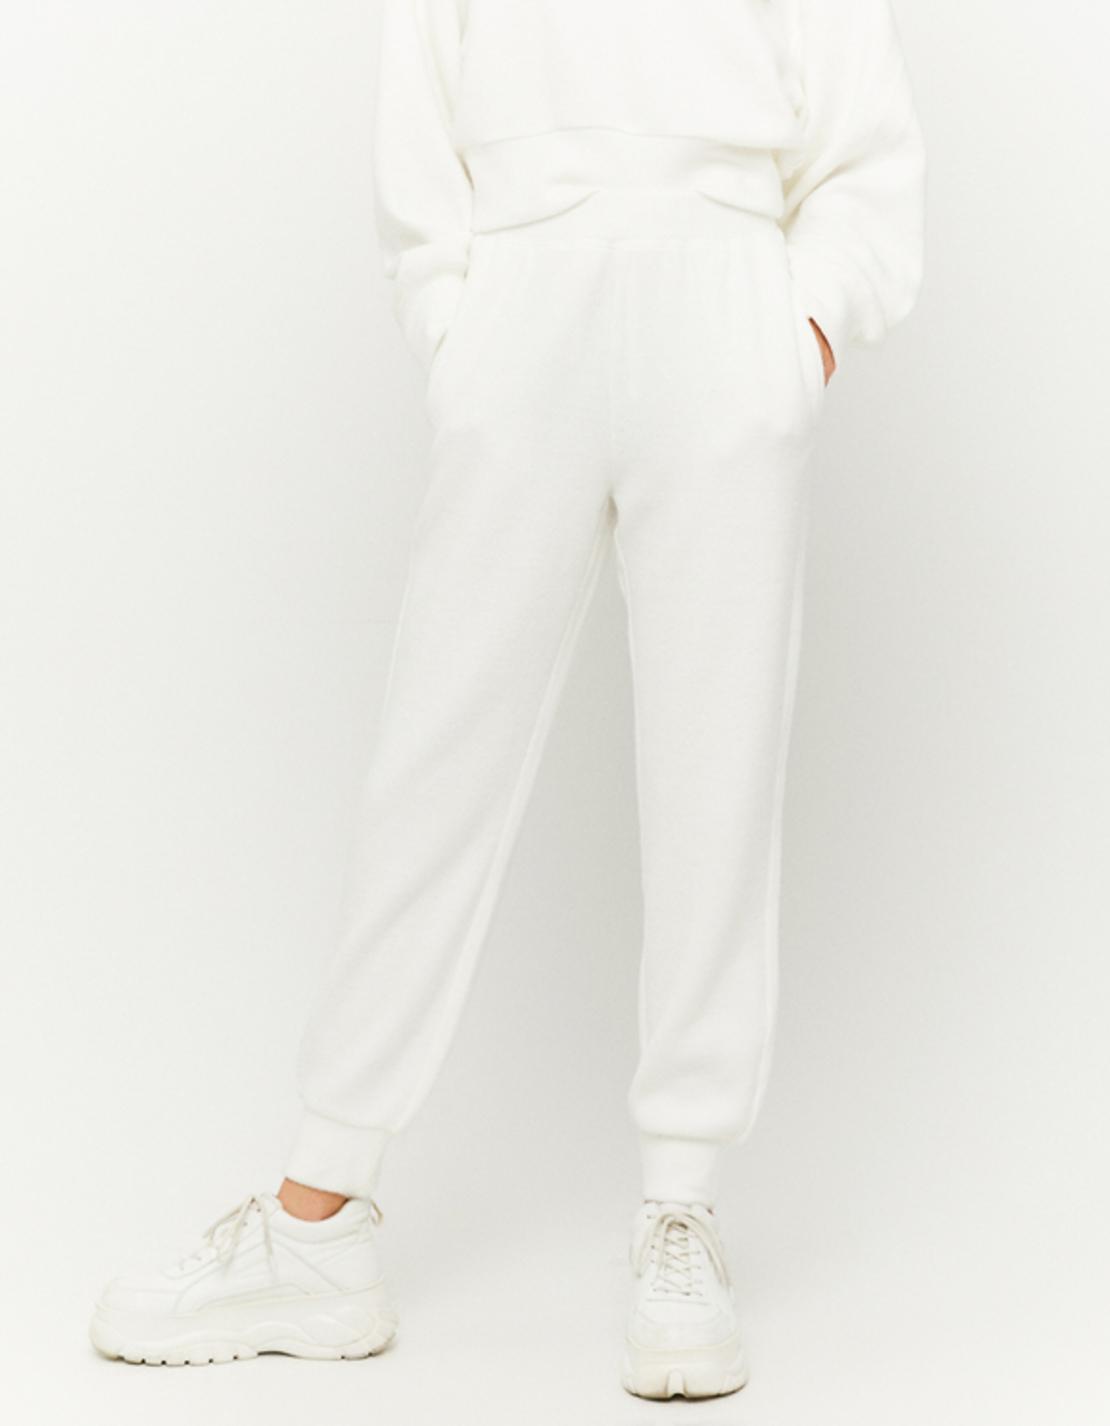 SPAPEJODA-AQ WHI006 מכנס ג'וגינג צמר